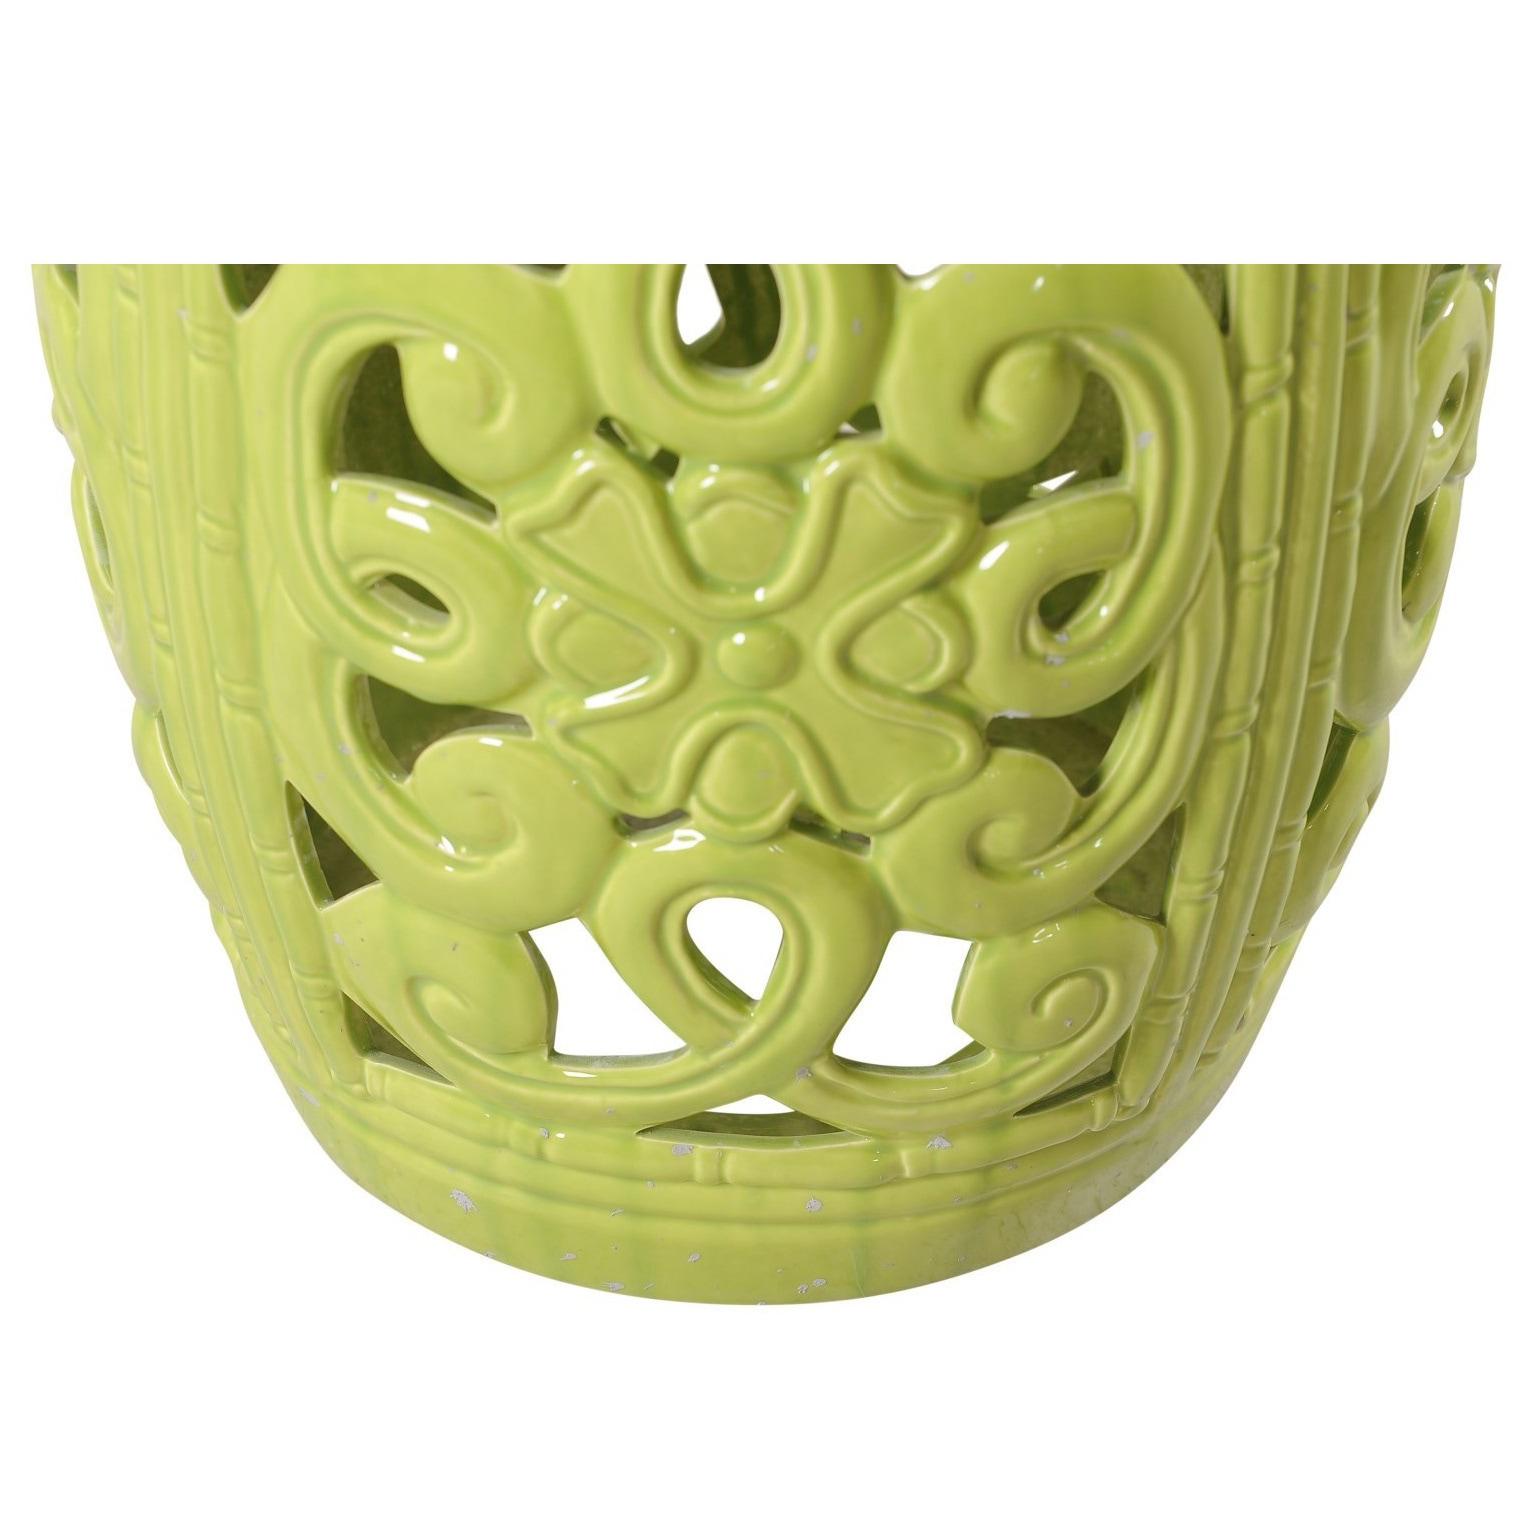 Beau Shop Lime Green Ceramic Garden Stool   Free Shipping Today   Overstock.com    12096924